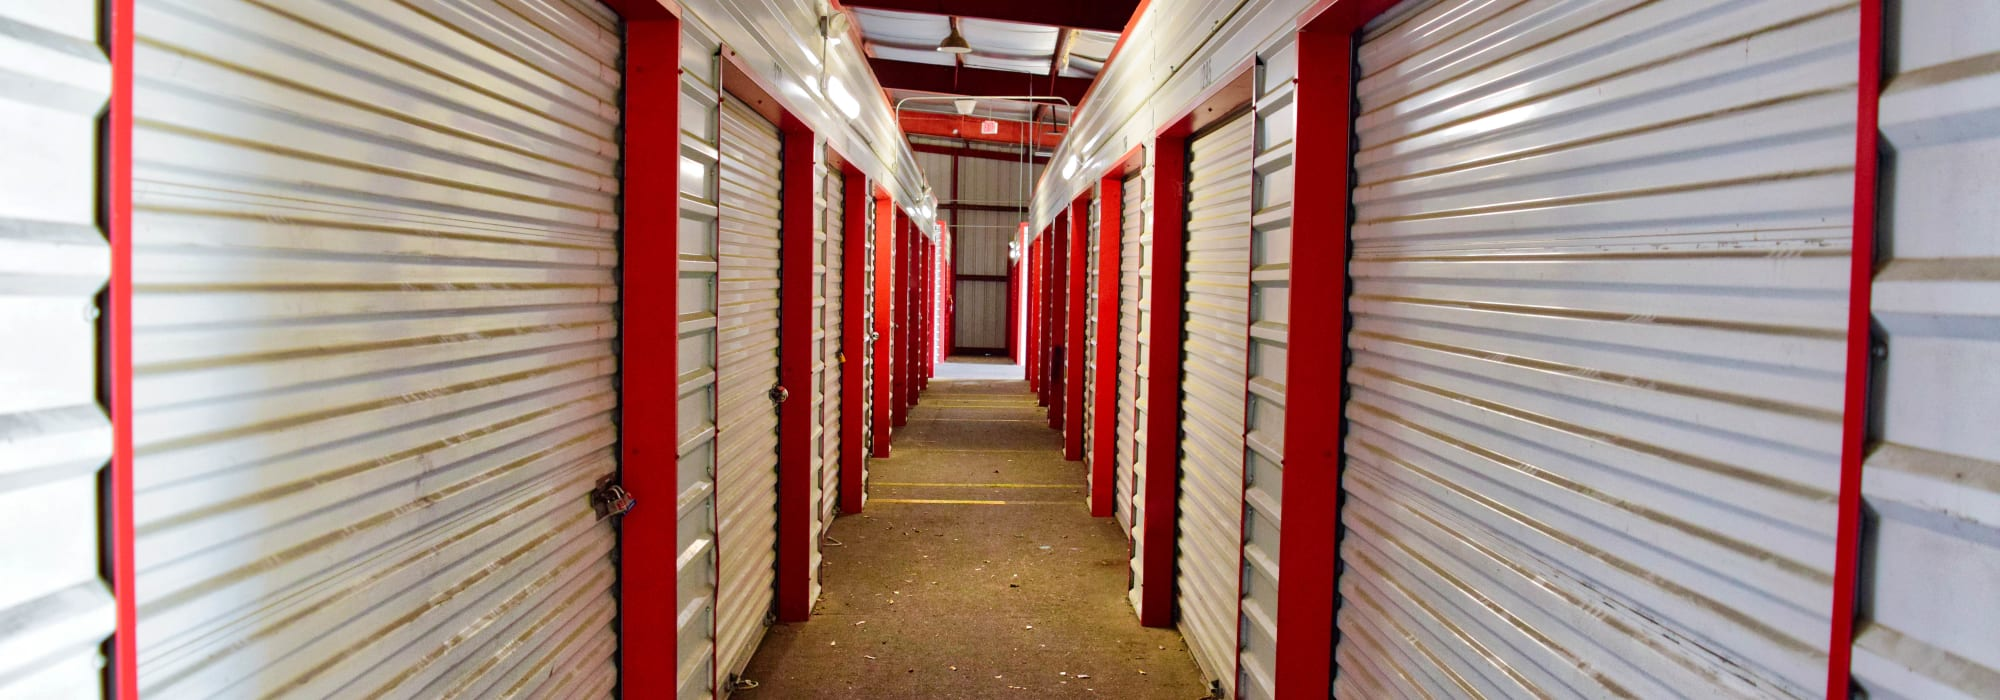 Interior Units at Lockaway Storage in Texarkana, Texas